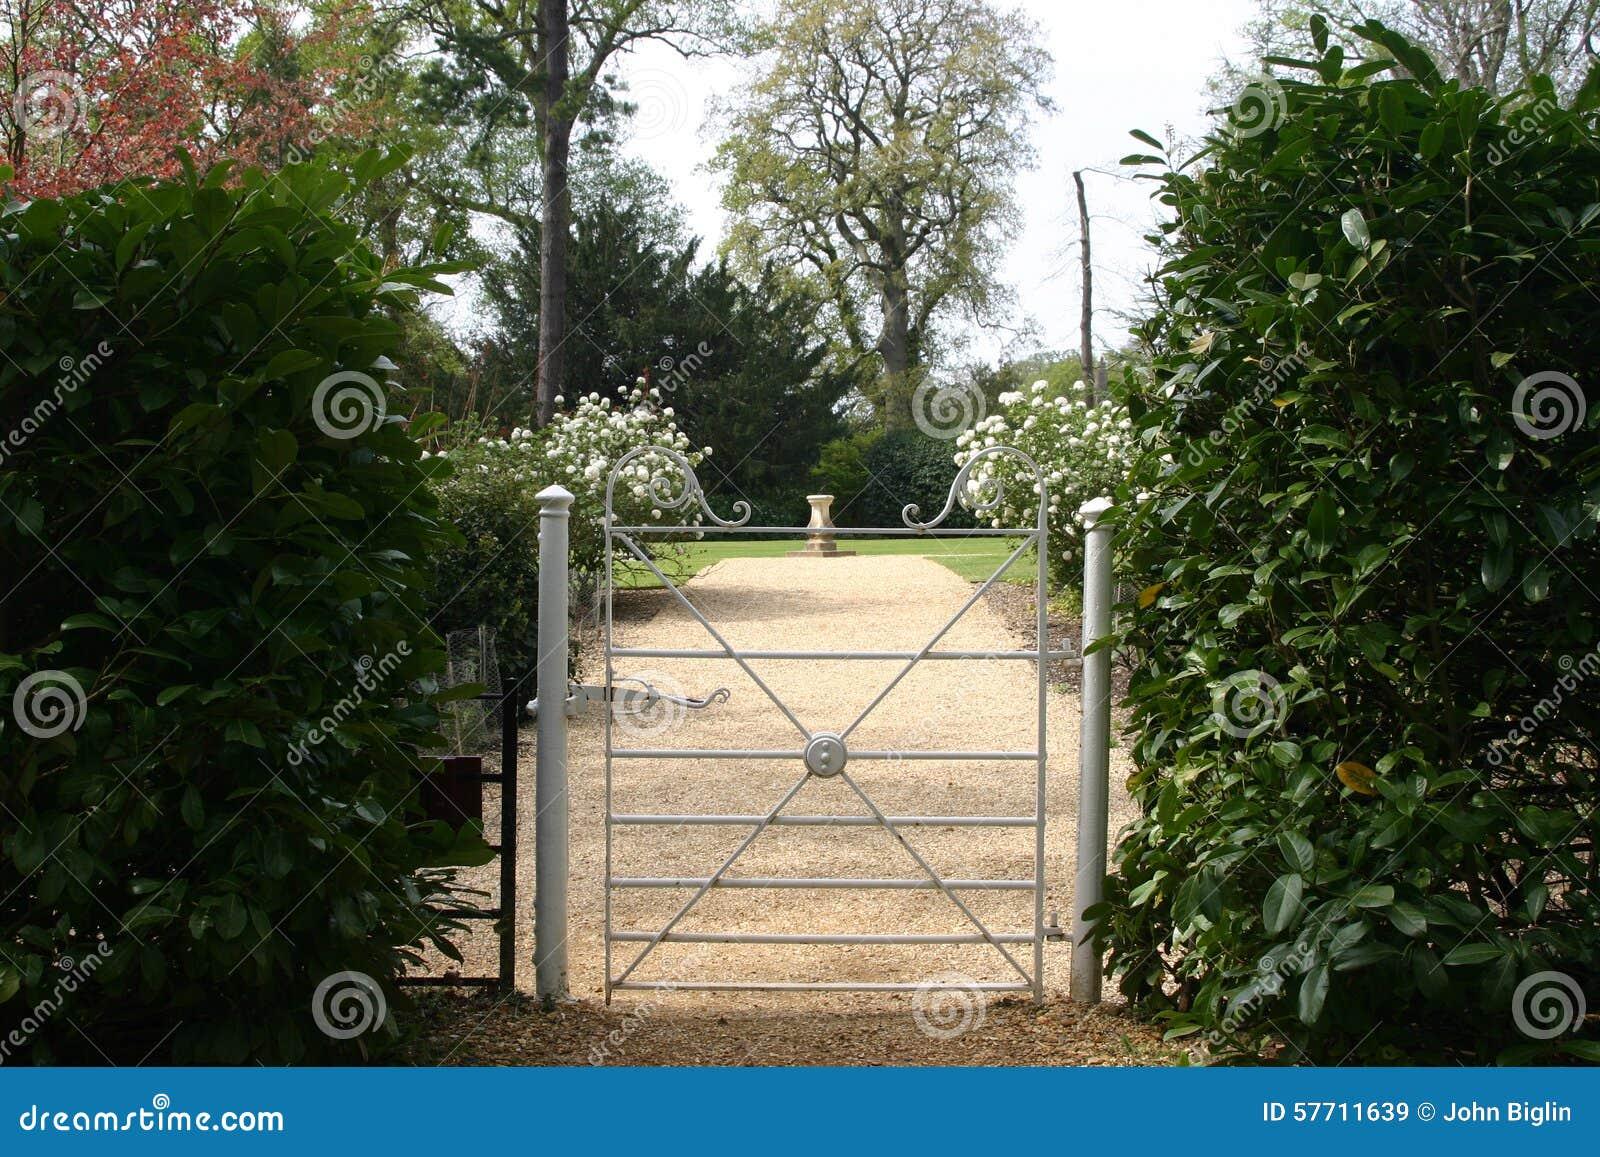 Gate opening into garden